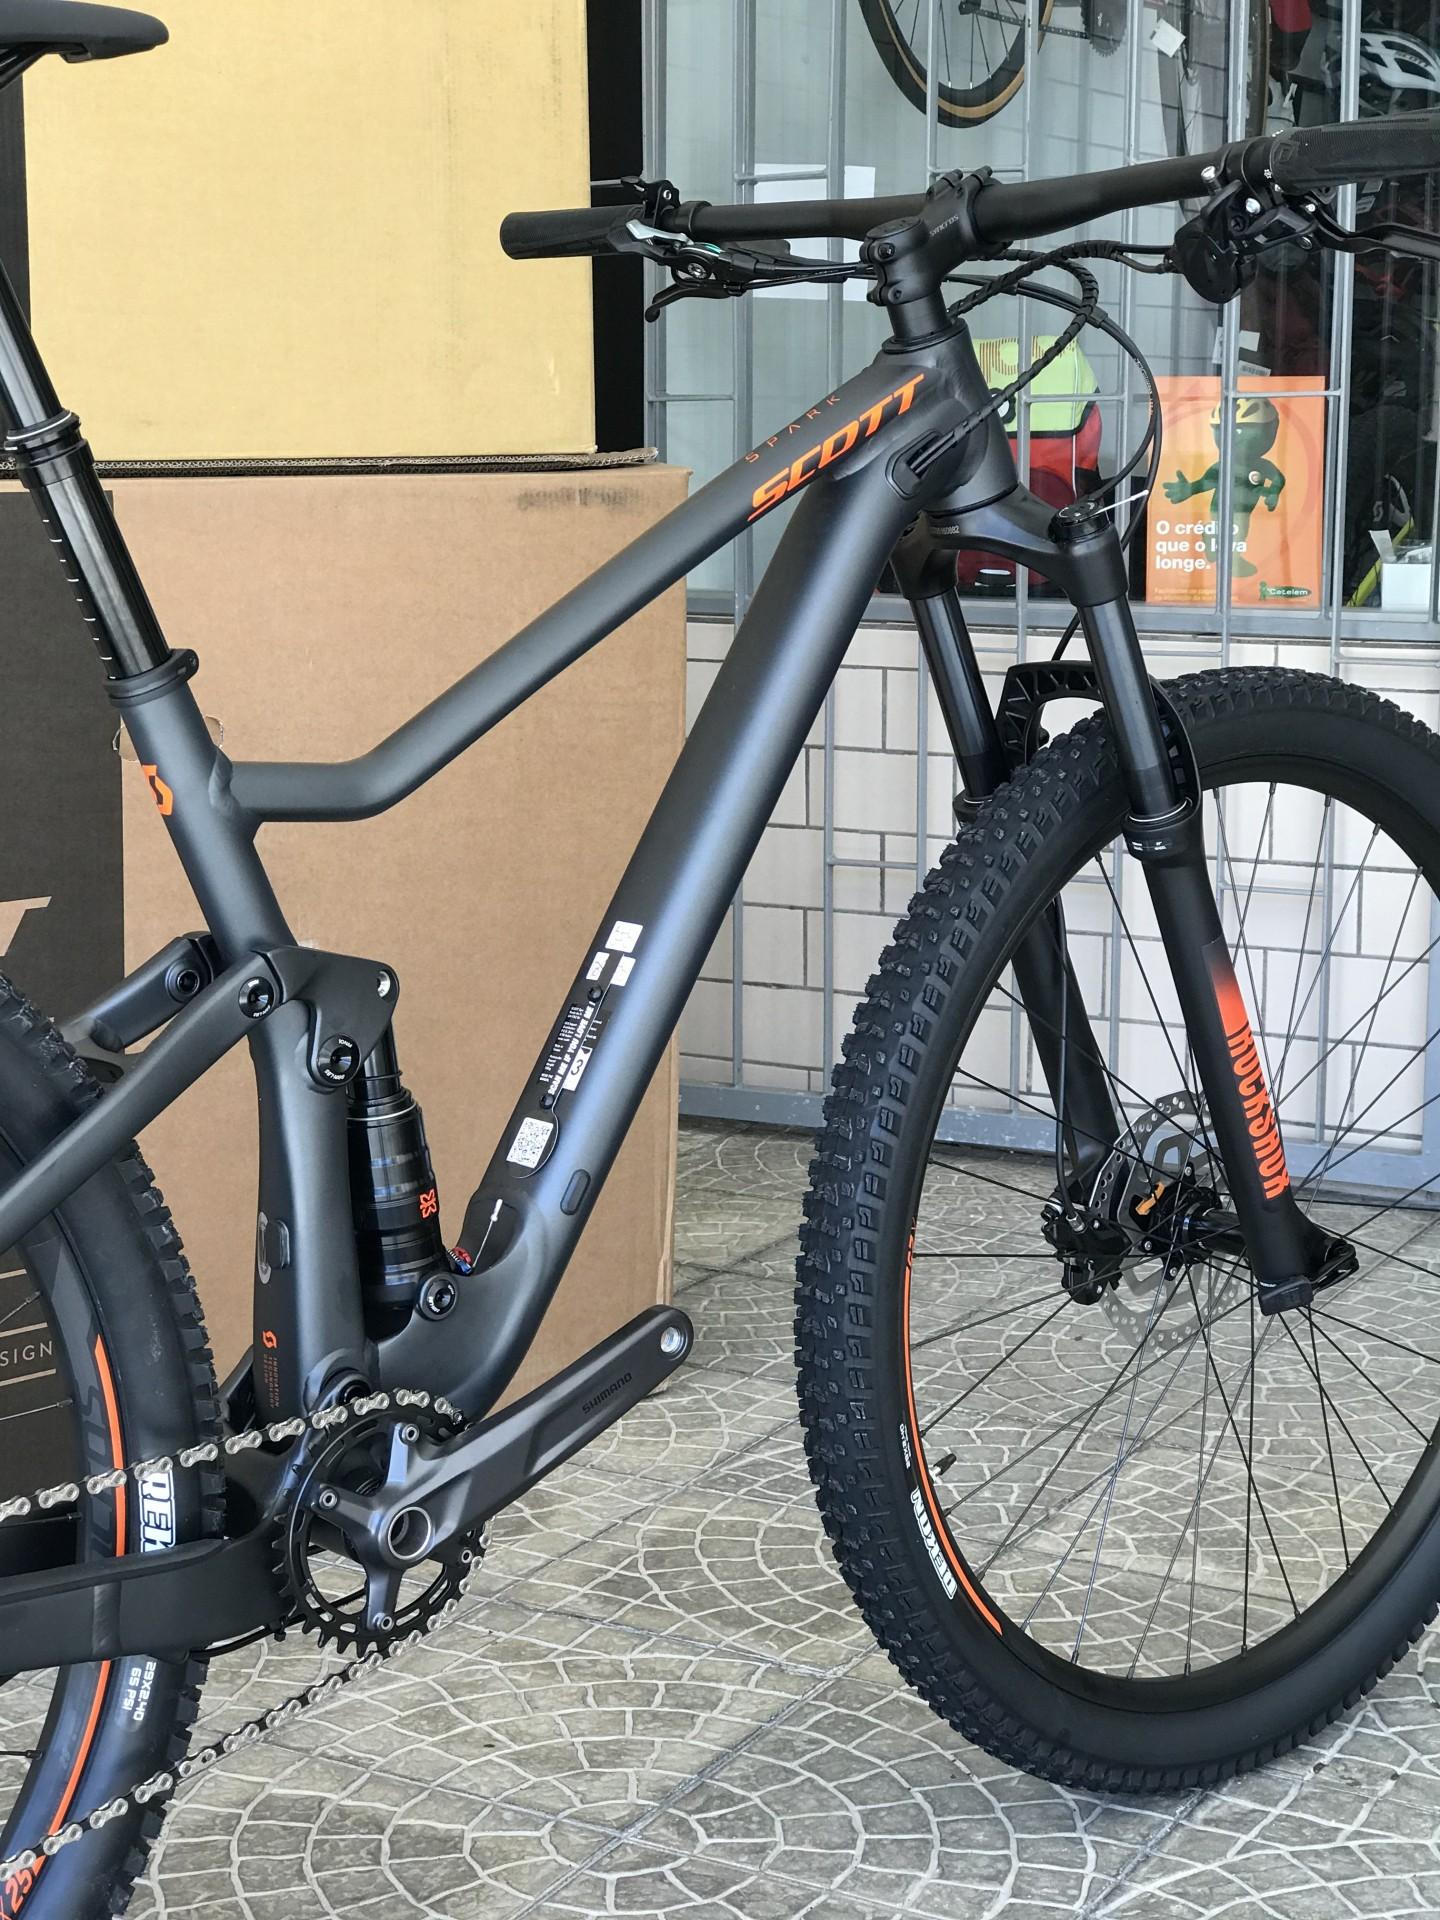 BICICLETA SCOTT SPARK 960 DARK GREY - 2021